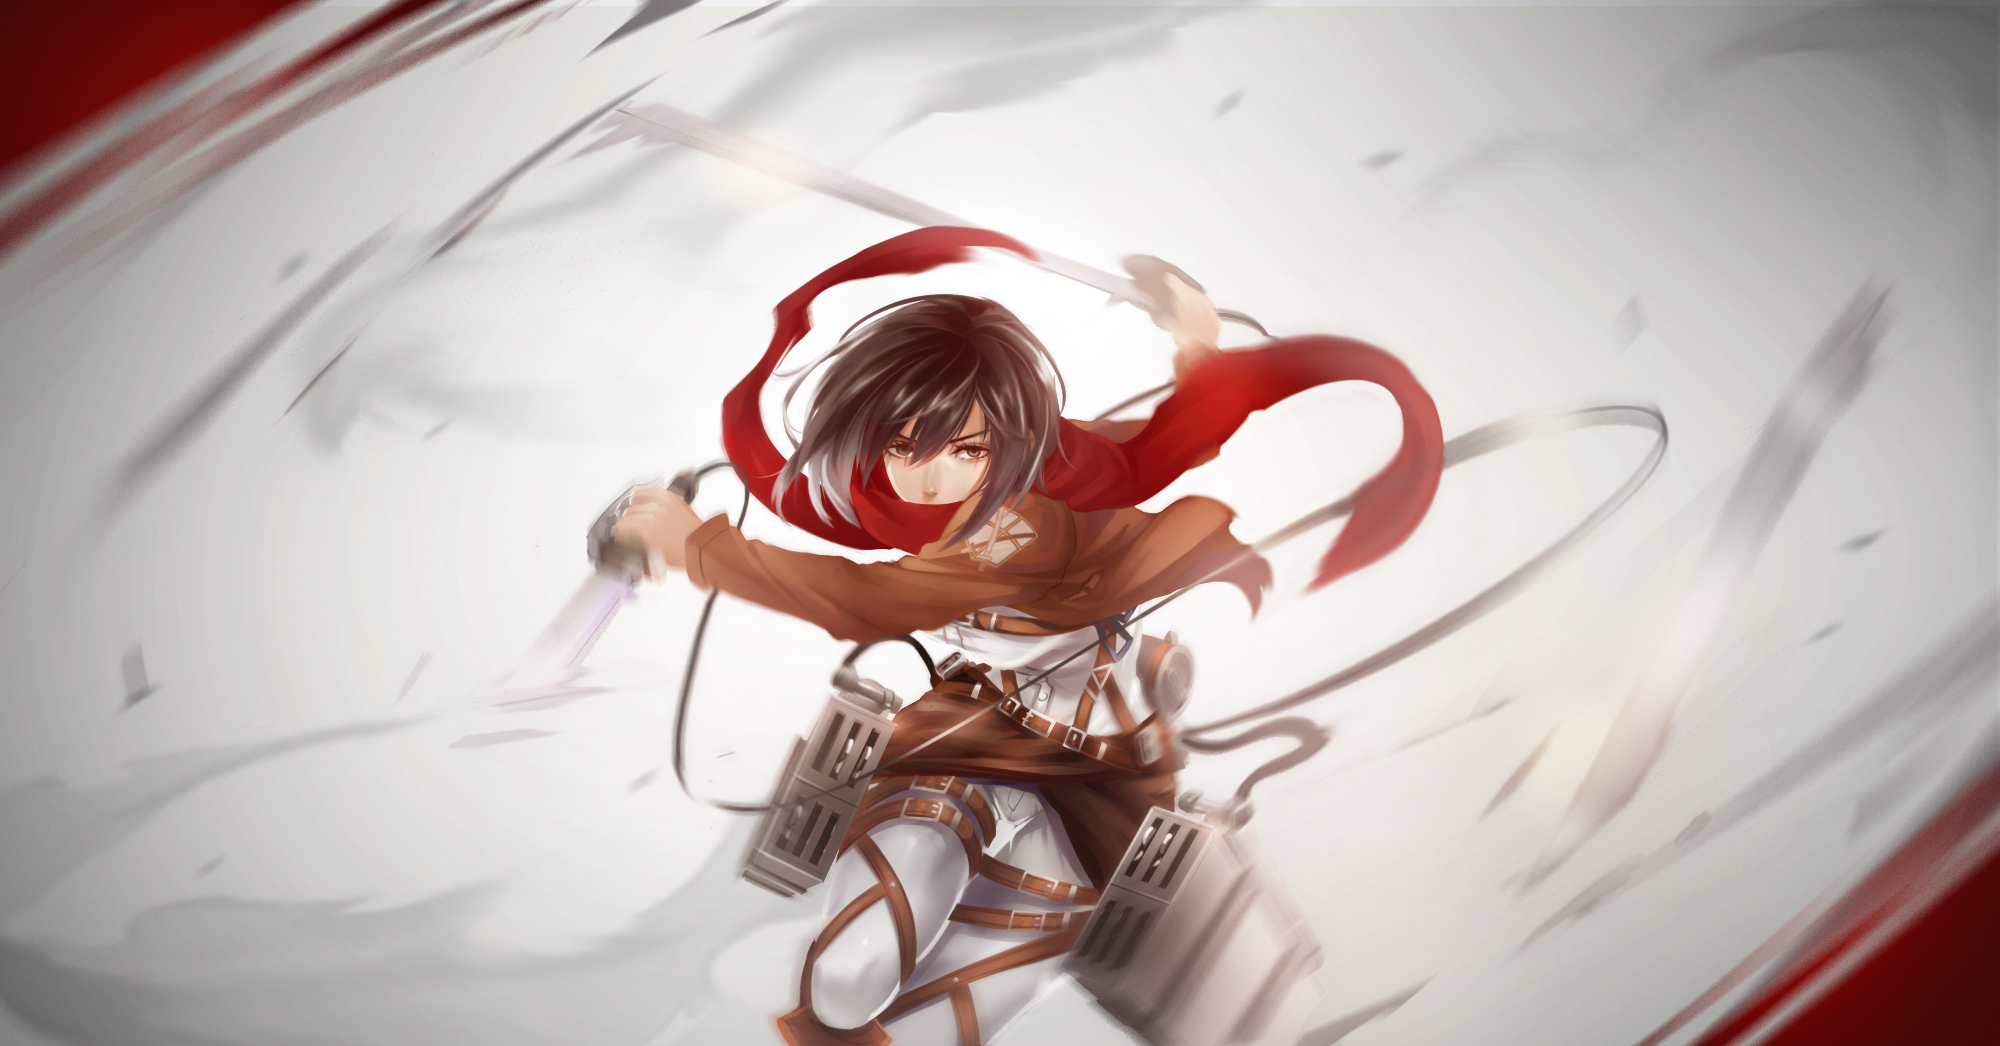 Shingeki No Kyojin Mikasa Wallpaper And Background Image 2000x1046 Id 607700 Wallpaper Abyss